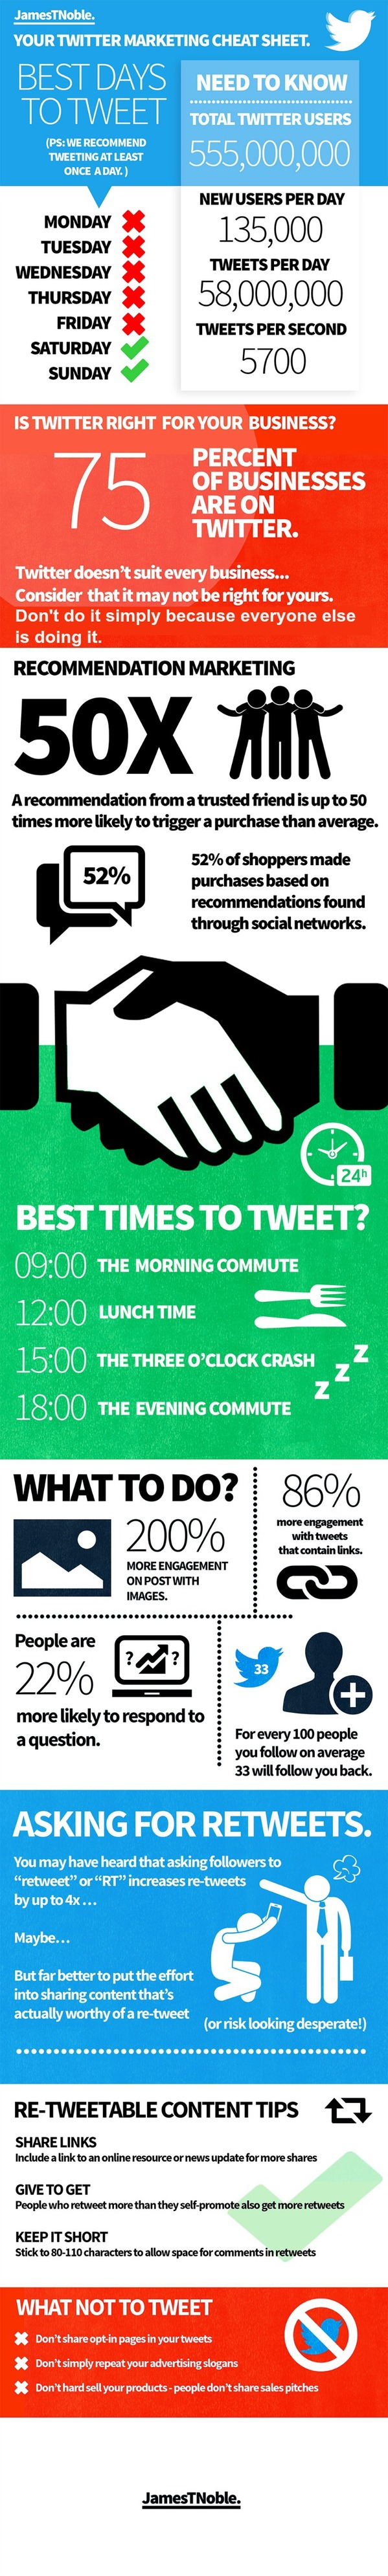 Twitter-Infographic-JTNoble-thumb-600x3981-20527